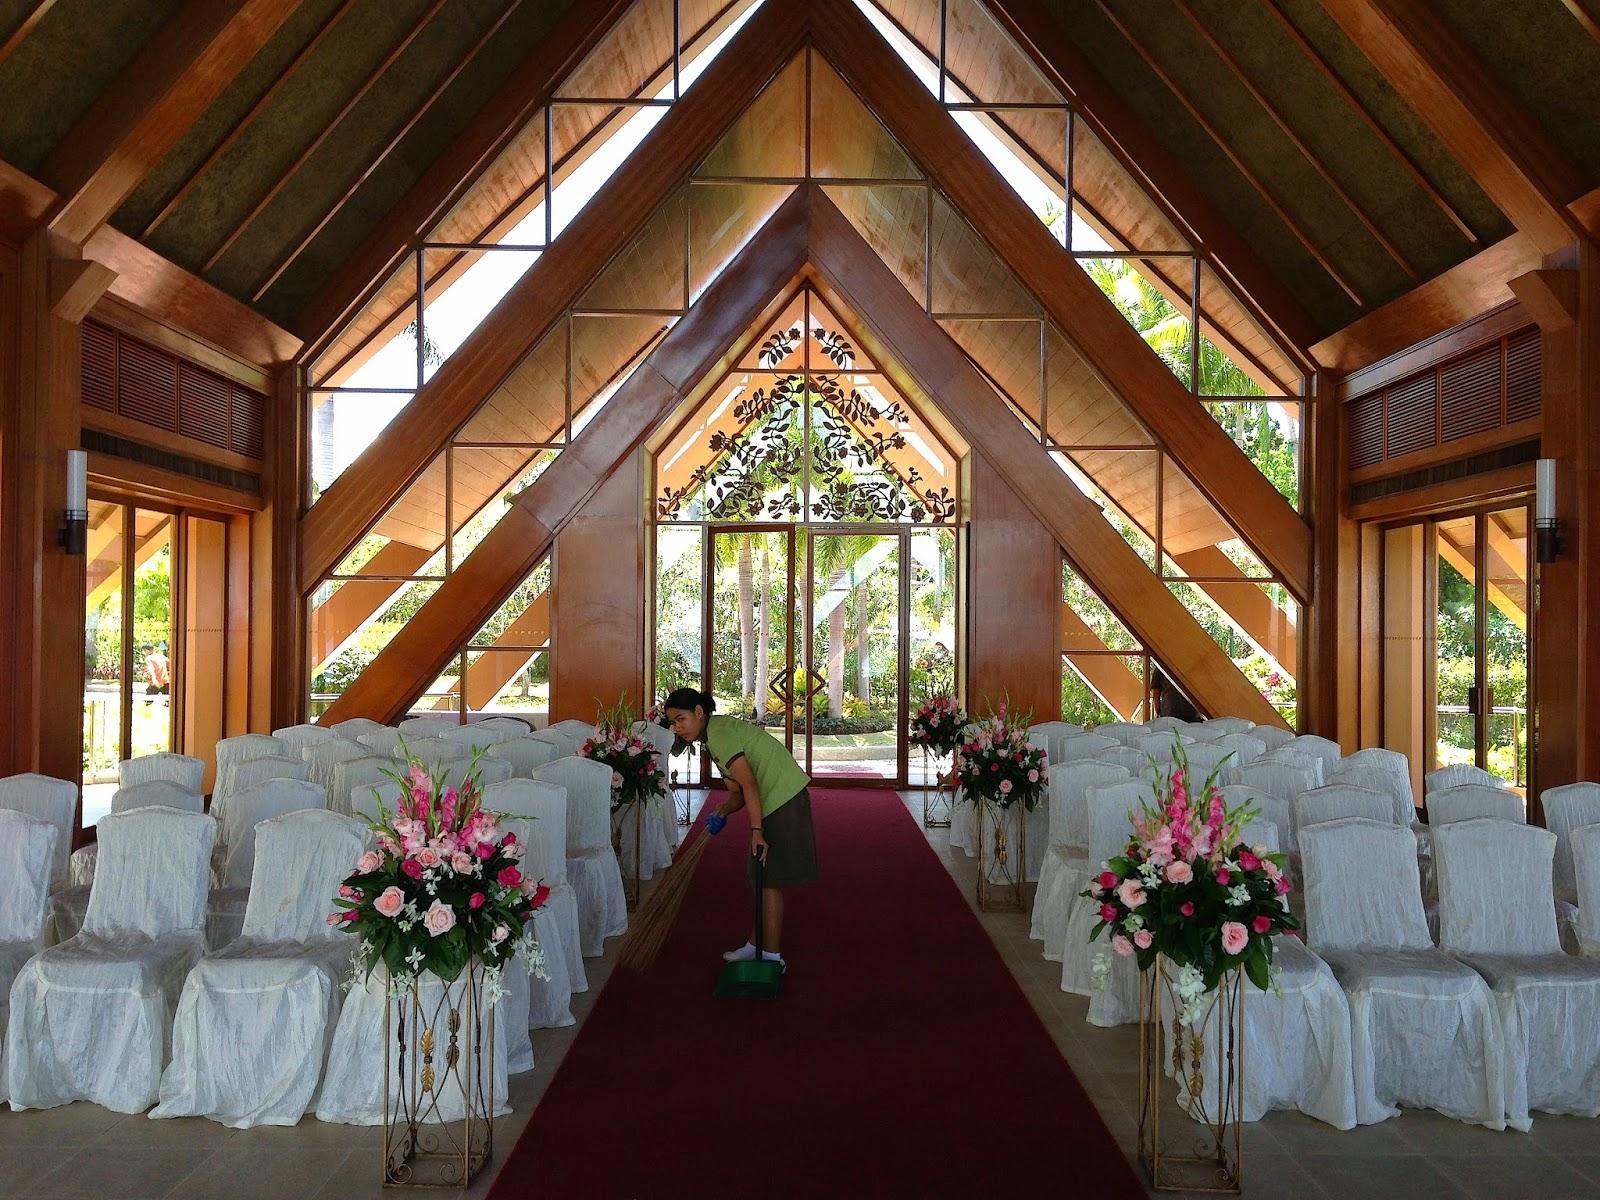 Pavilion, Shangrila Mactan Resort & Spa, Cebu, Philippines